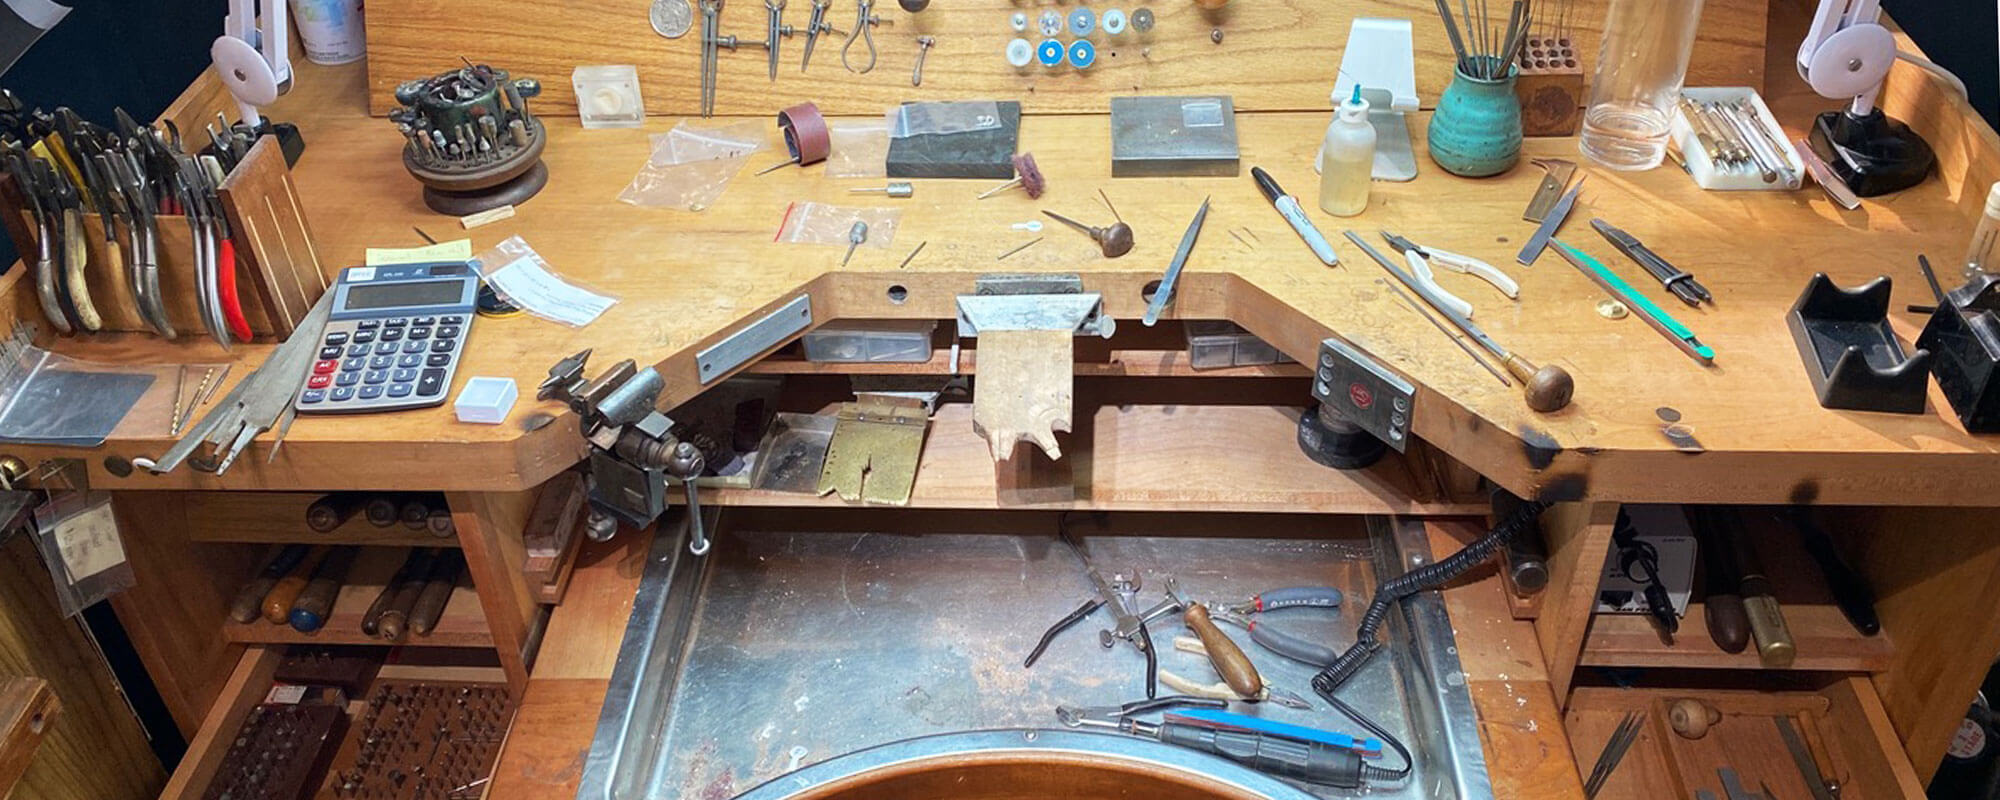 customer jewelry maker workbench